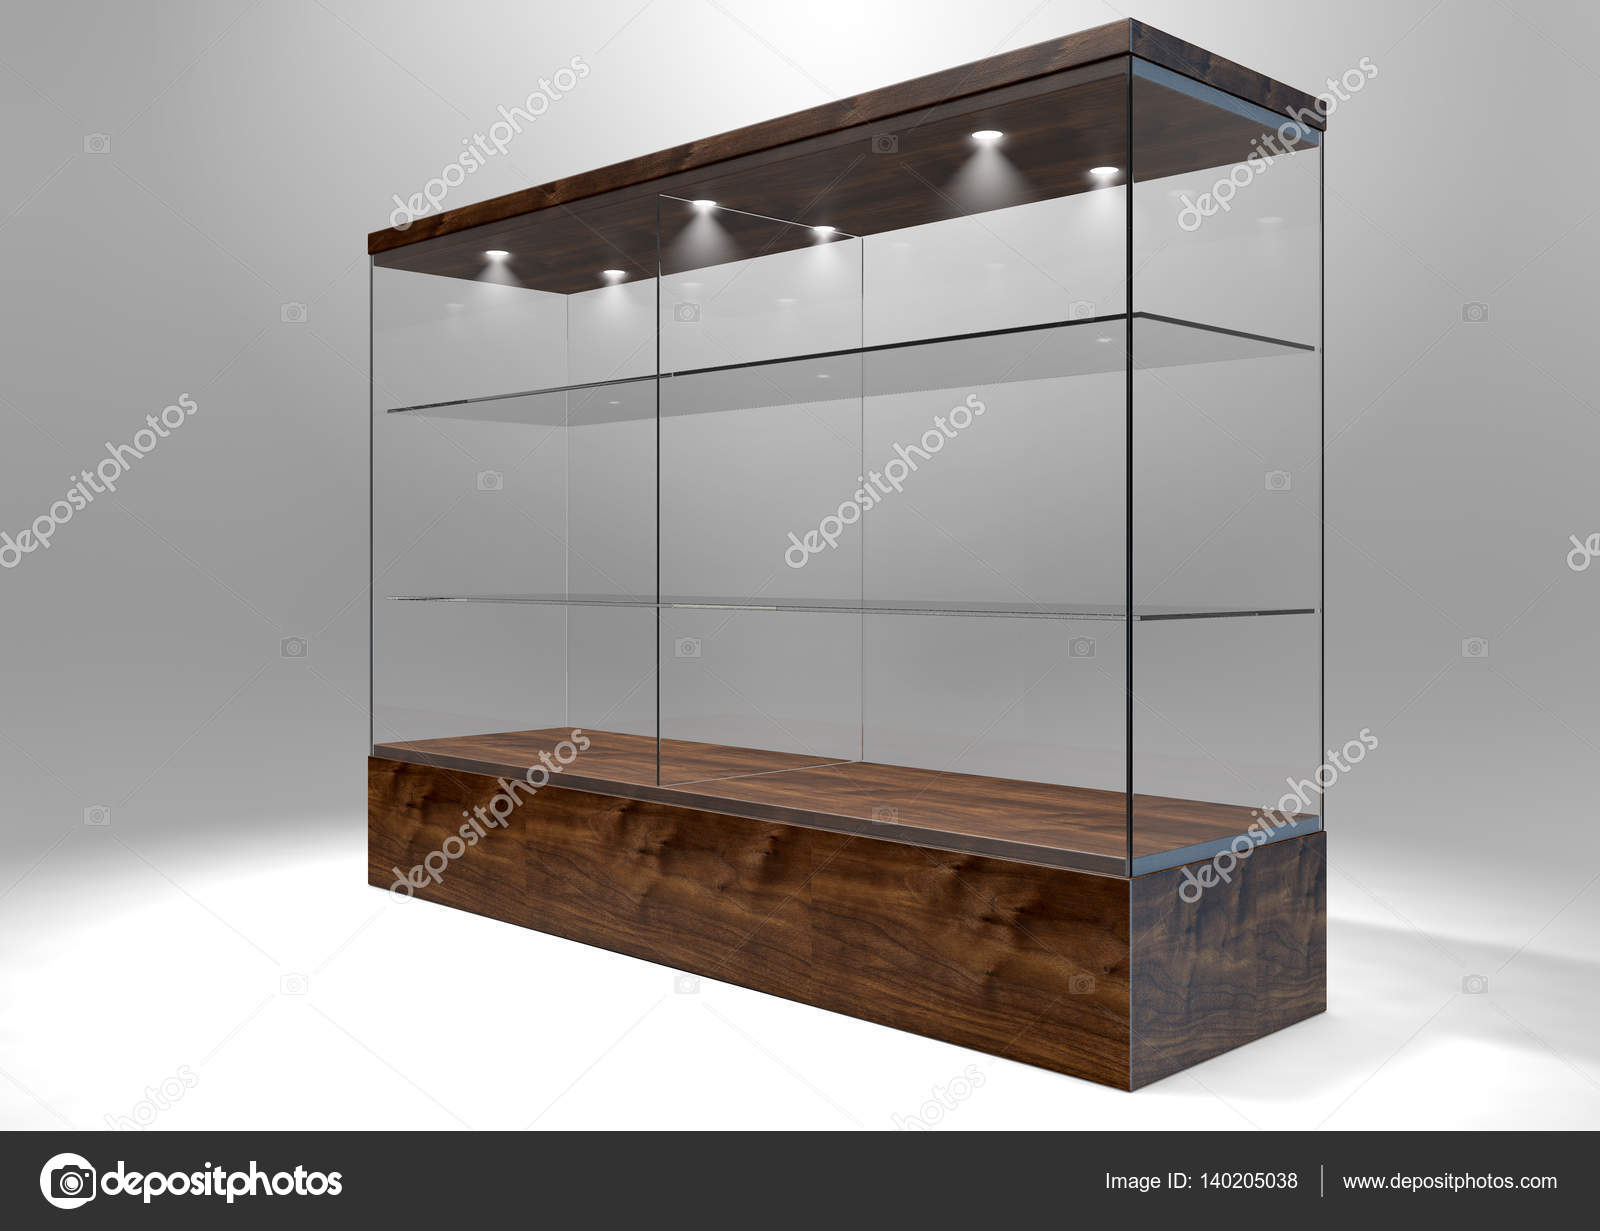 Vitrine Kast Glas : Glas vitrinekast u2014 stockfoto © albund #140205038